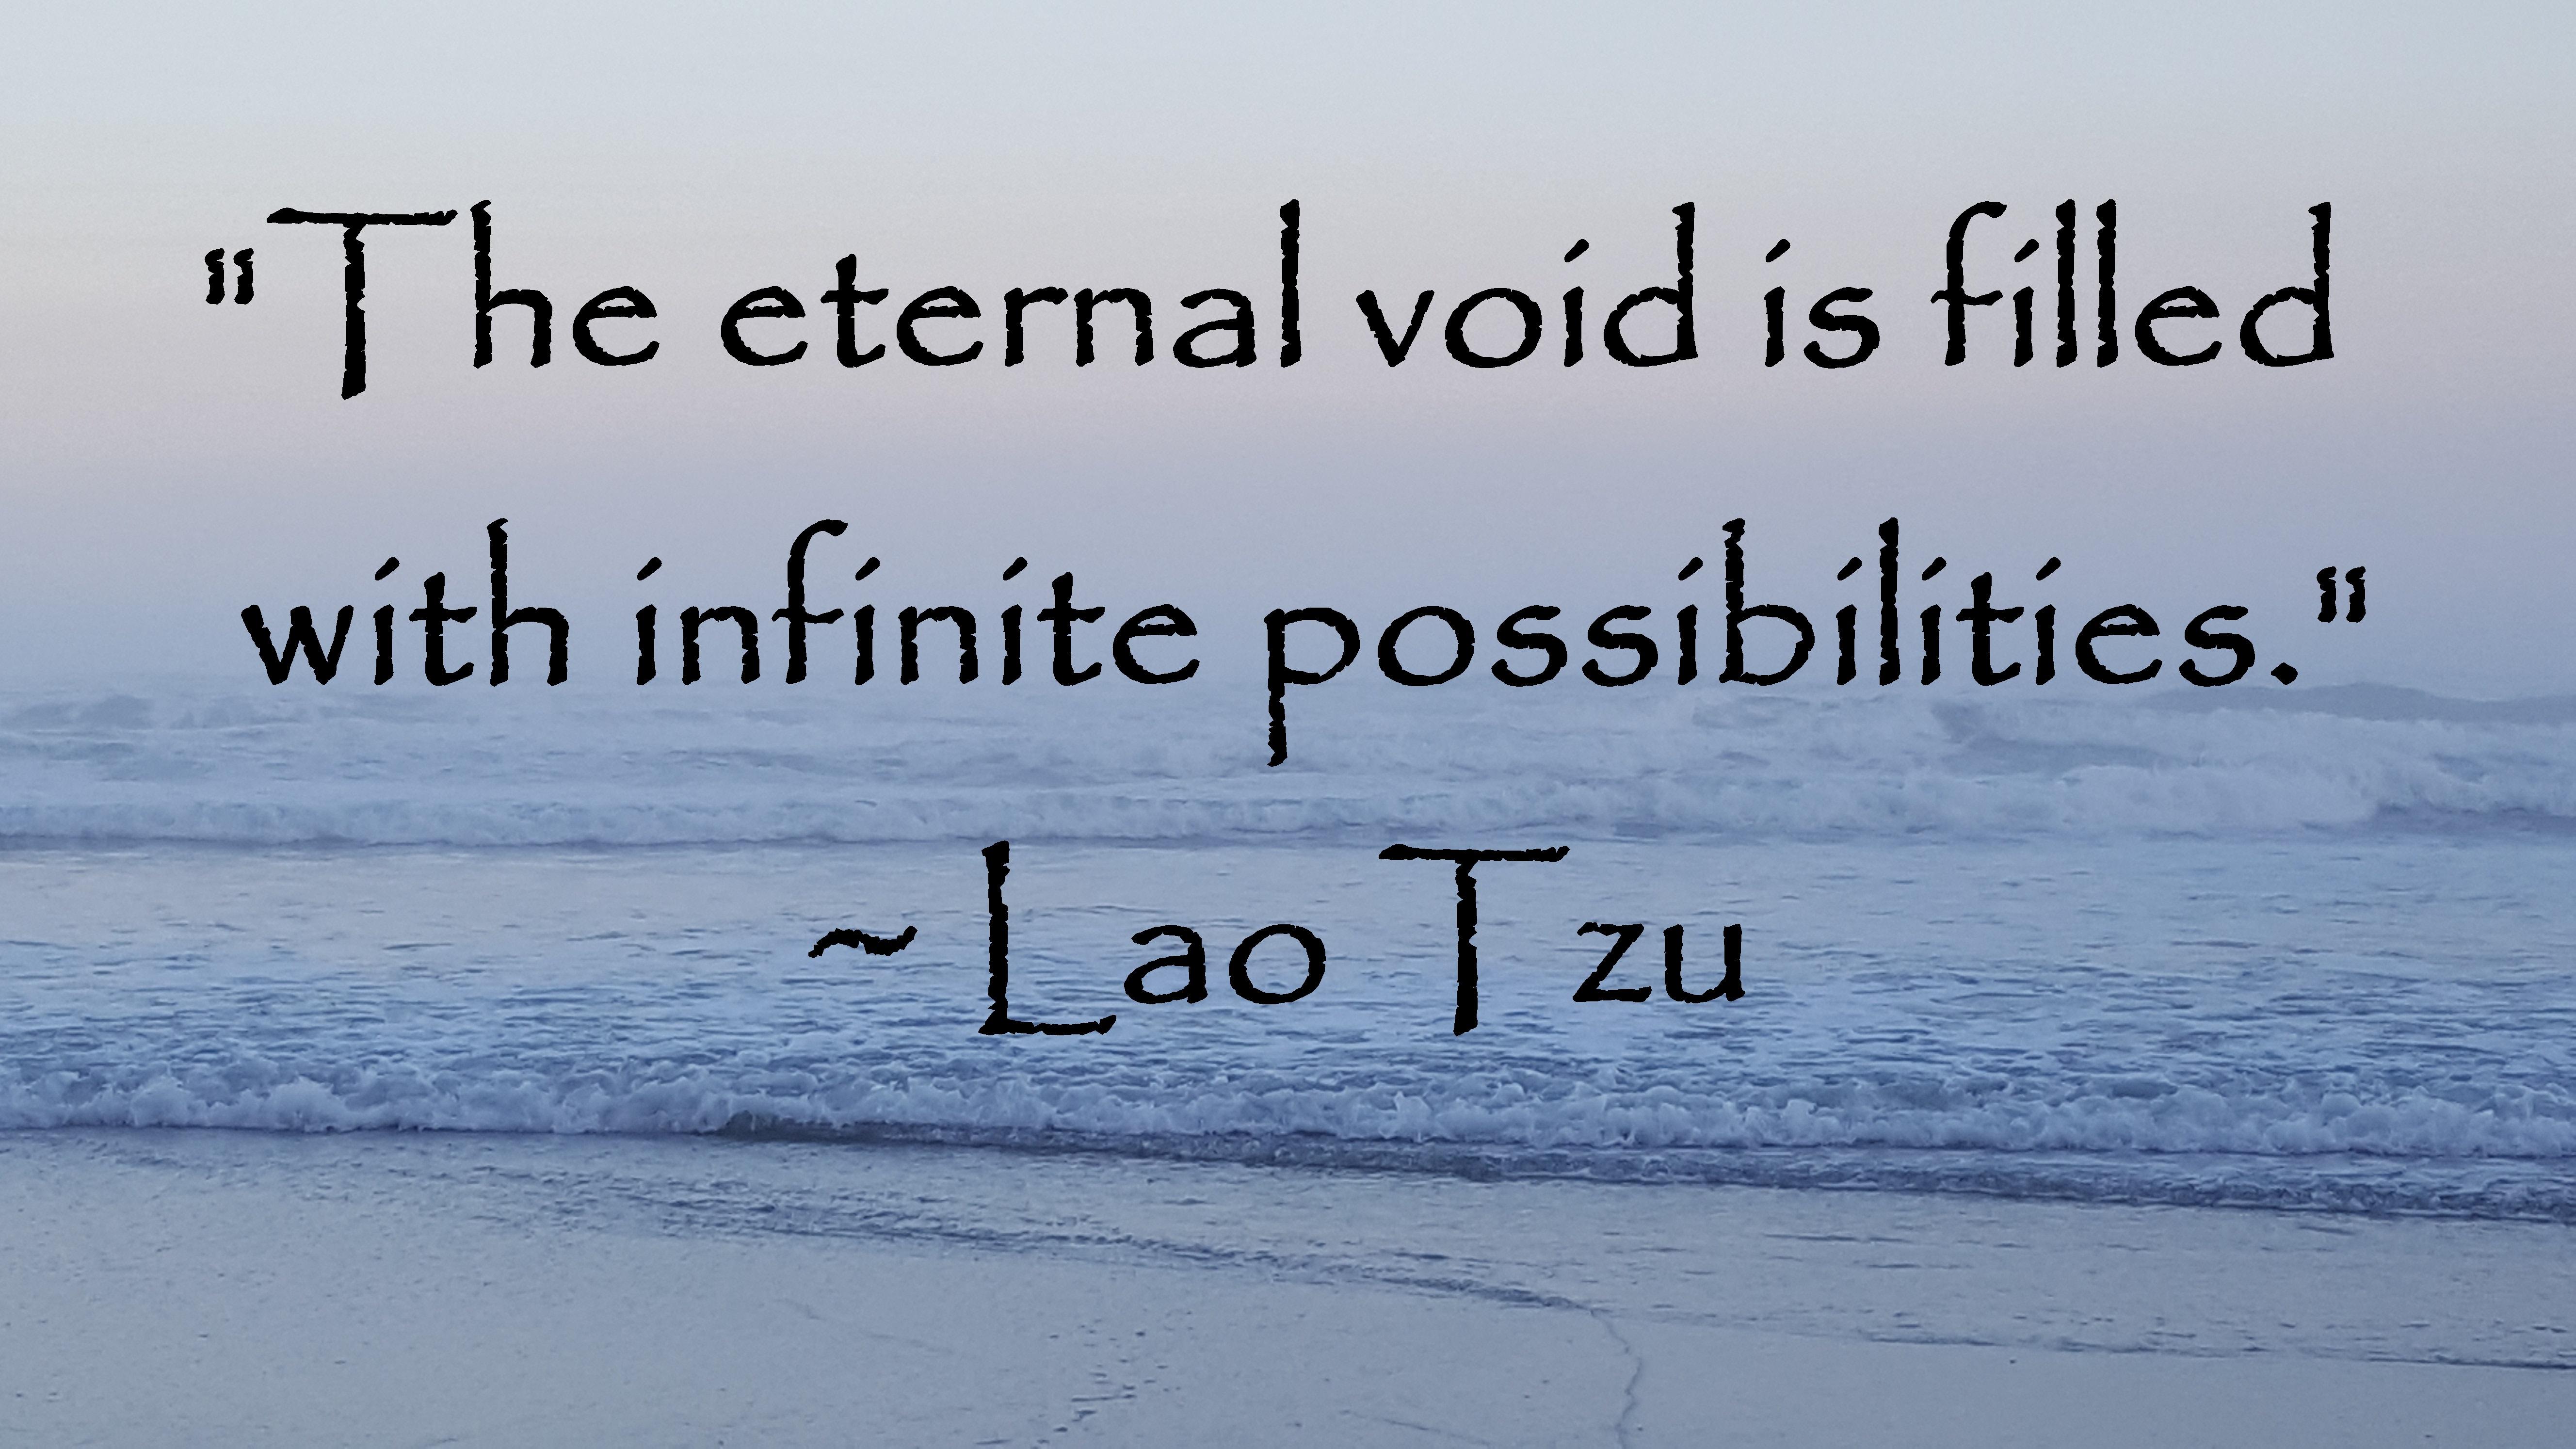 lao tzu - eternal void infinite possibilities